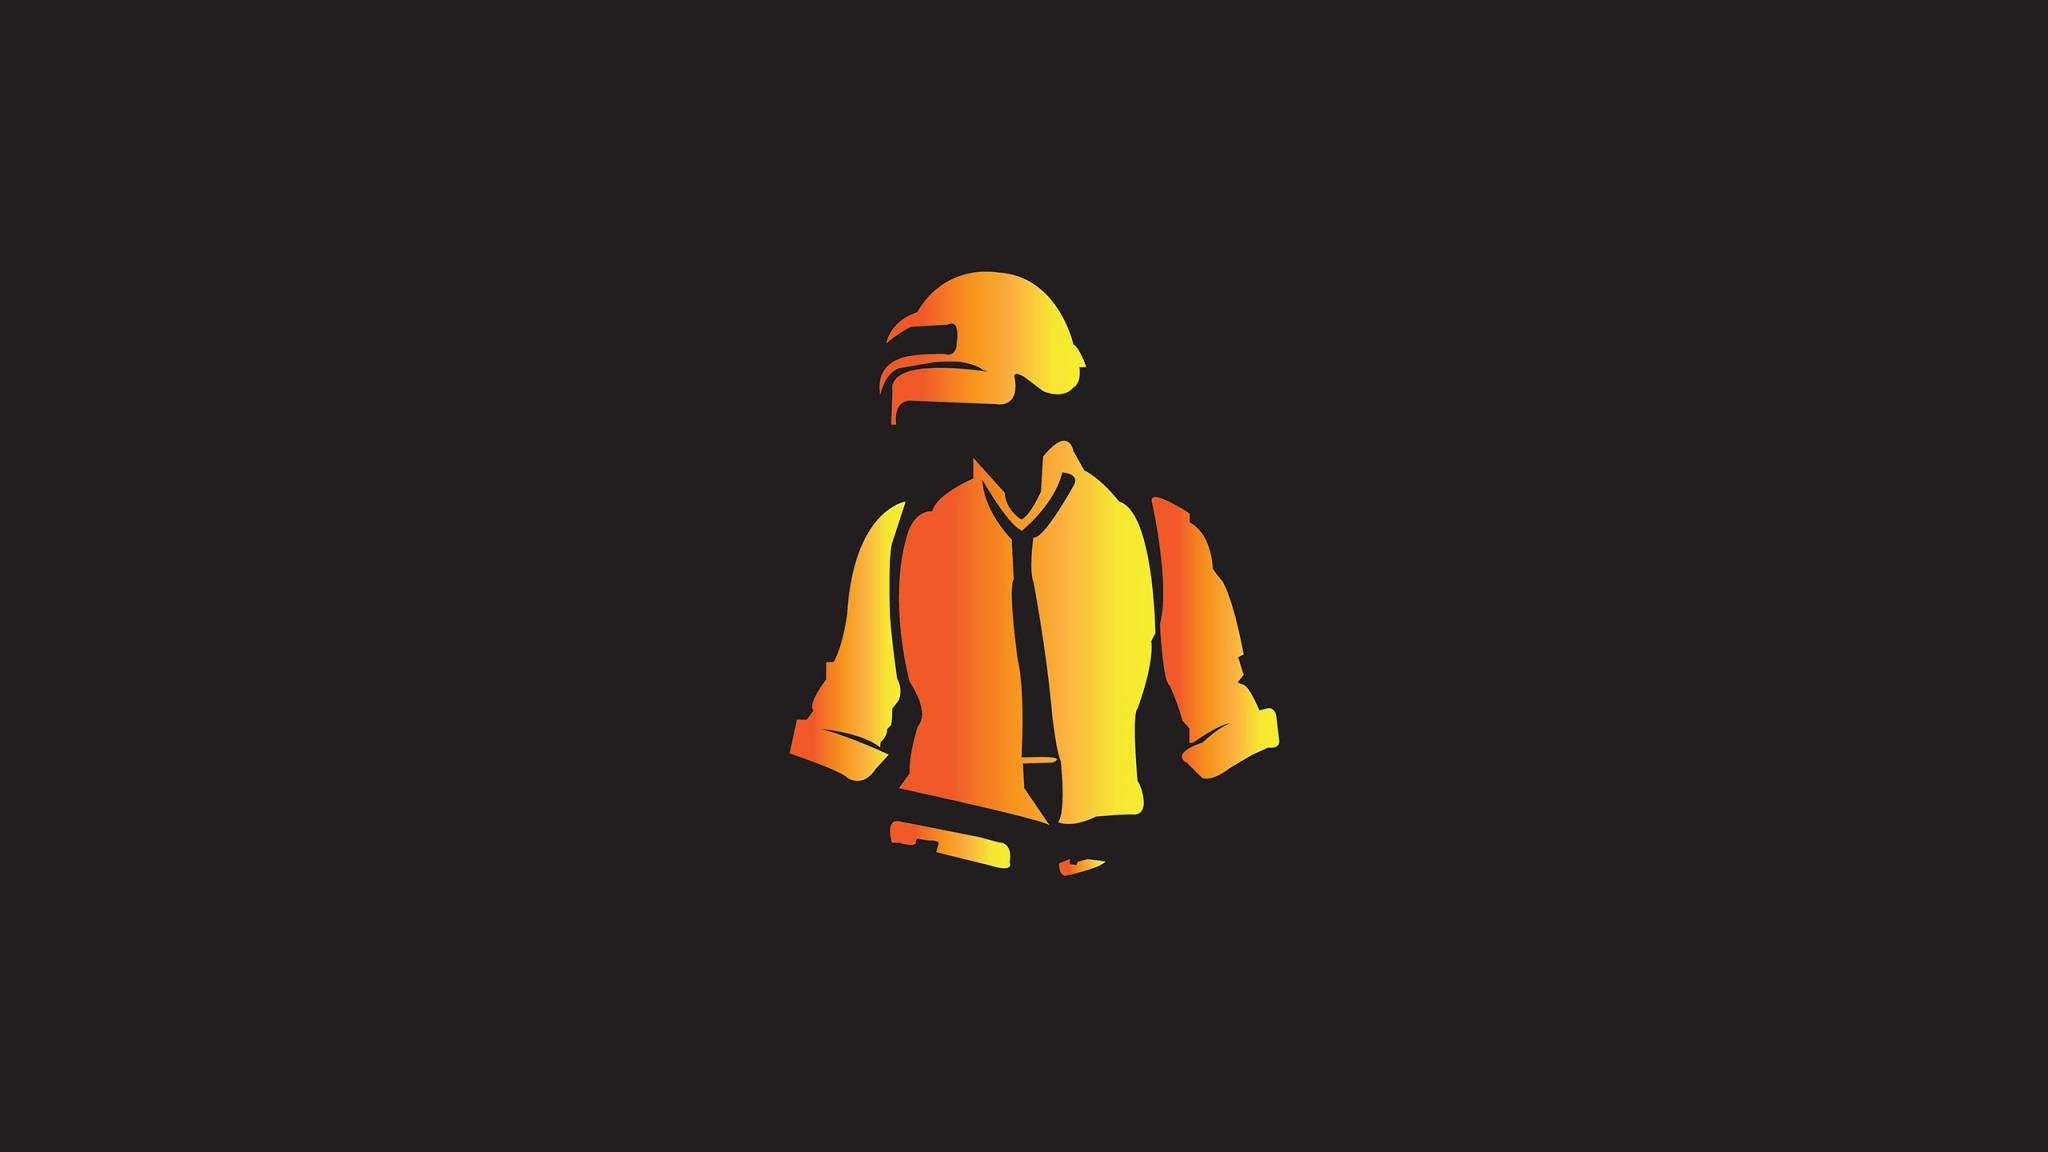 Download 2048x1152 Wallpaper Minimal Pubg Yellow Helmet